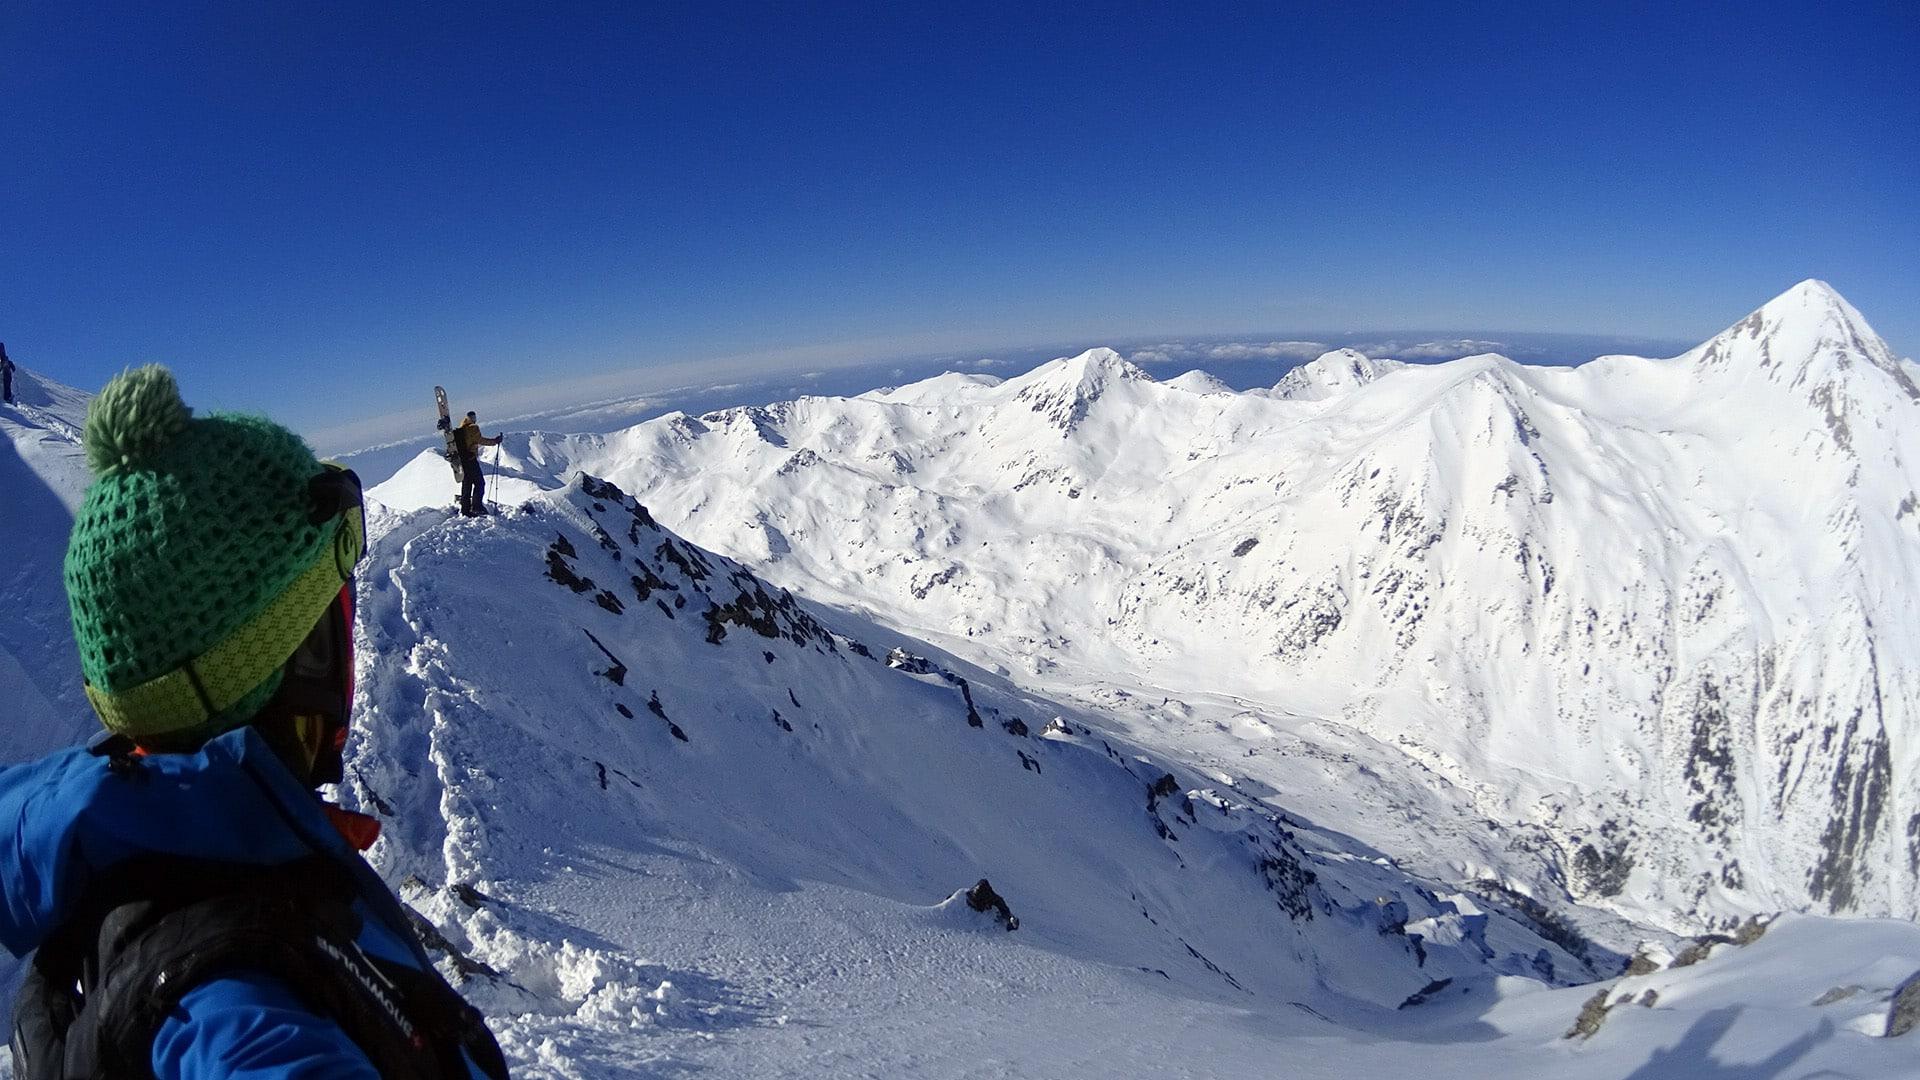 Bansko guided freeride ski and snowboard tour